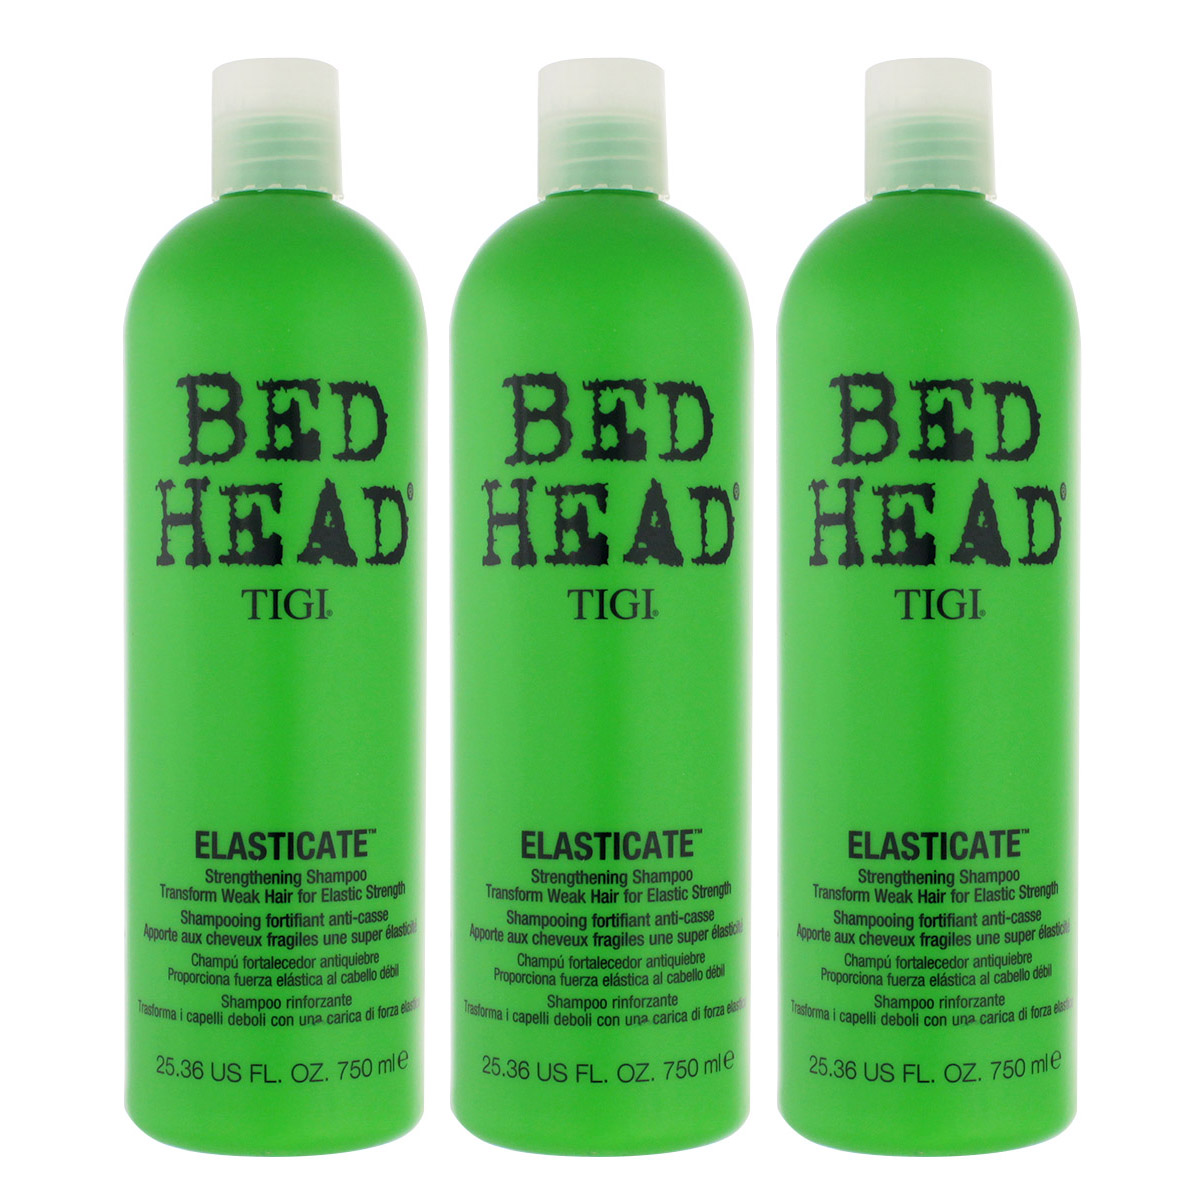 Tigi Bed Head Elasticate Strengthening Shampoo 3 x 750 ml